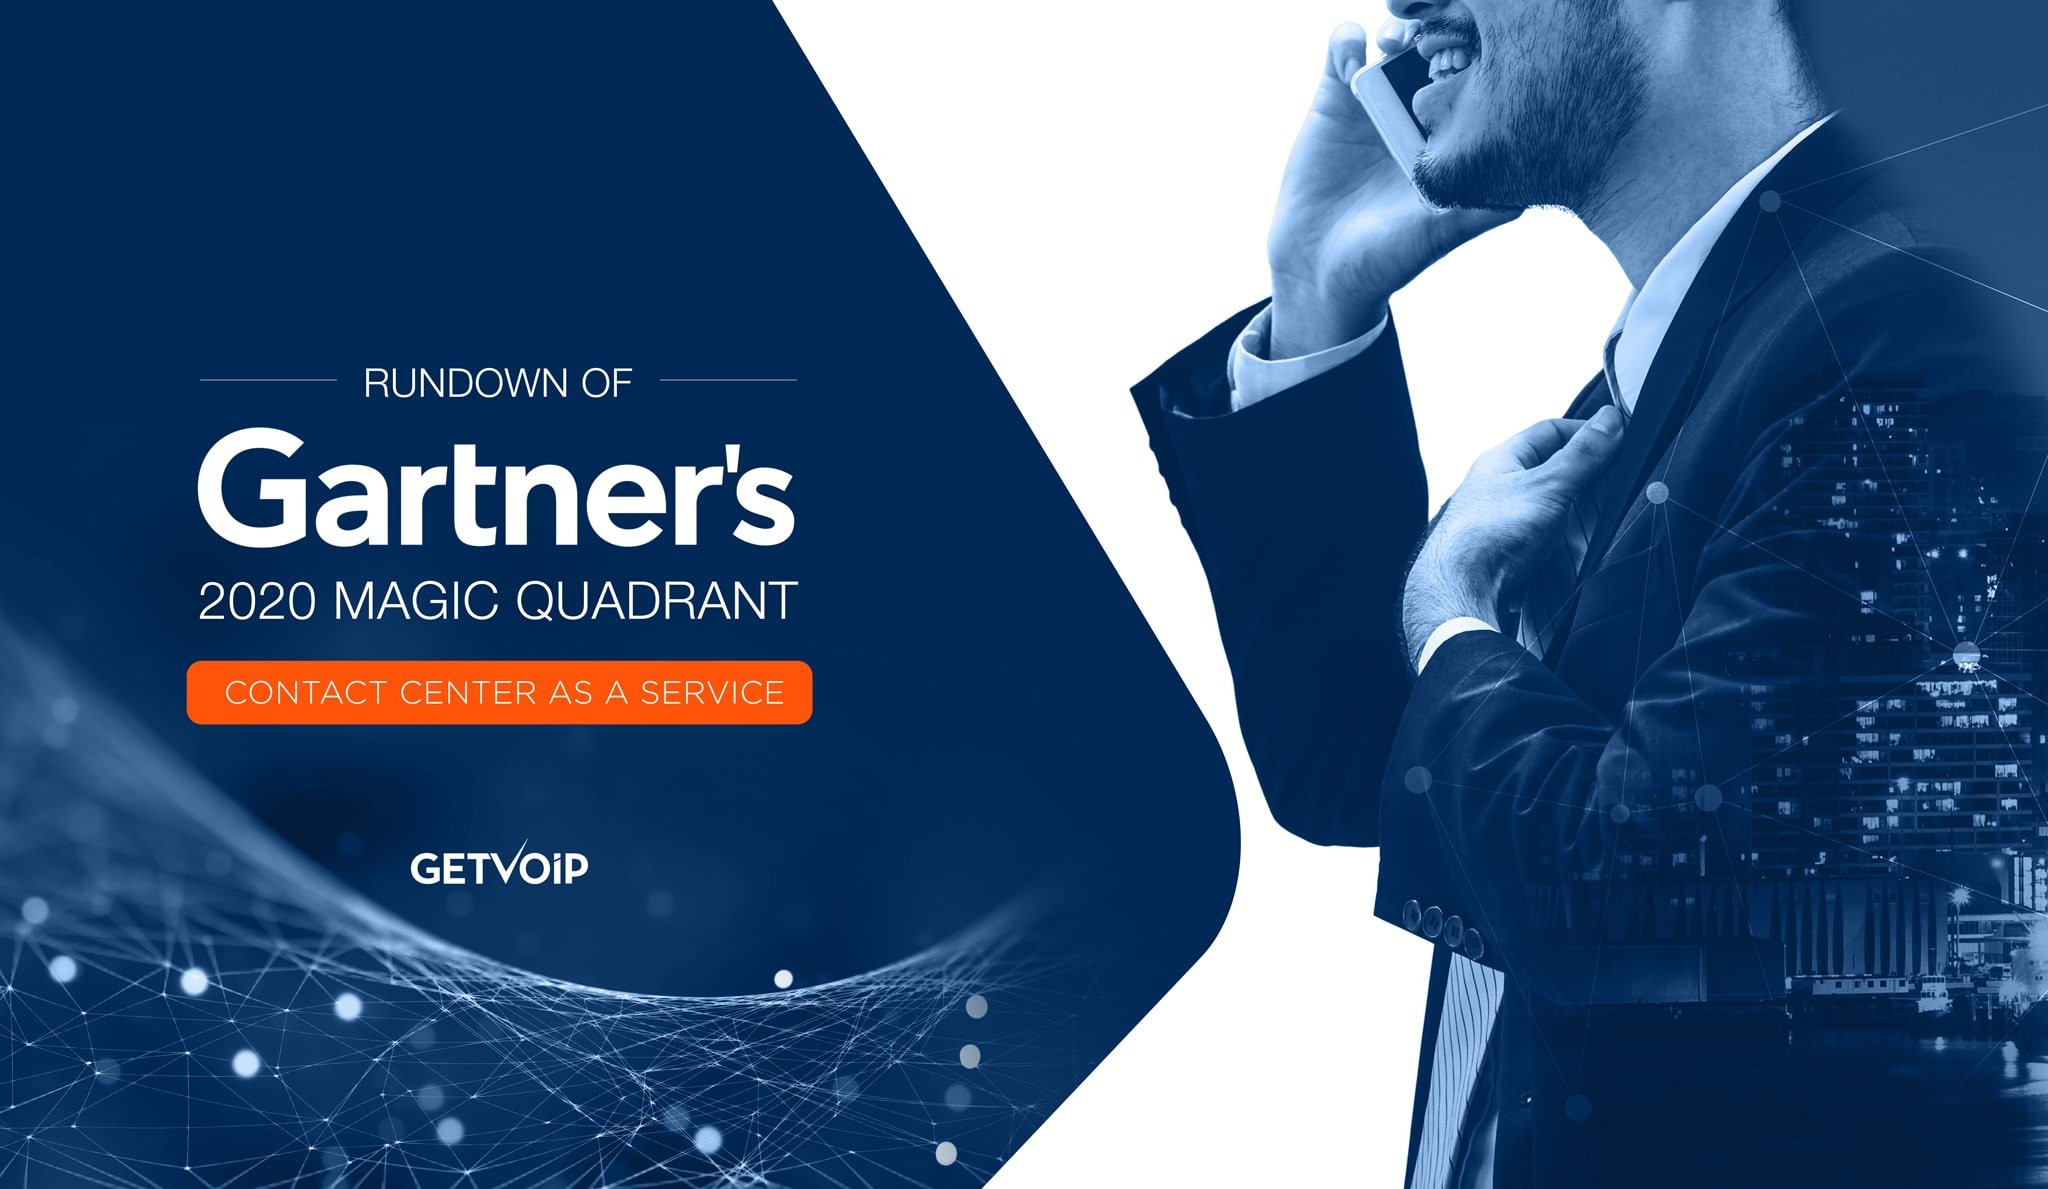 CCaaS Magic Quadrant 2020: Our Review of Gartner's Report